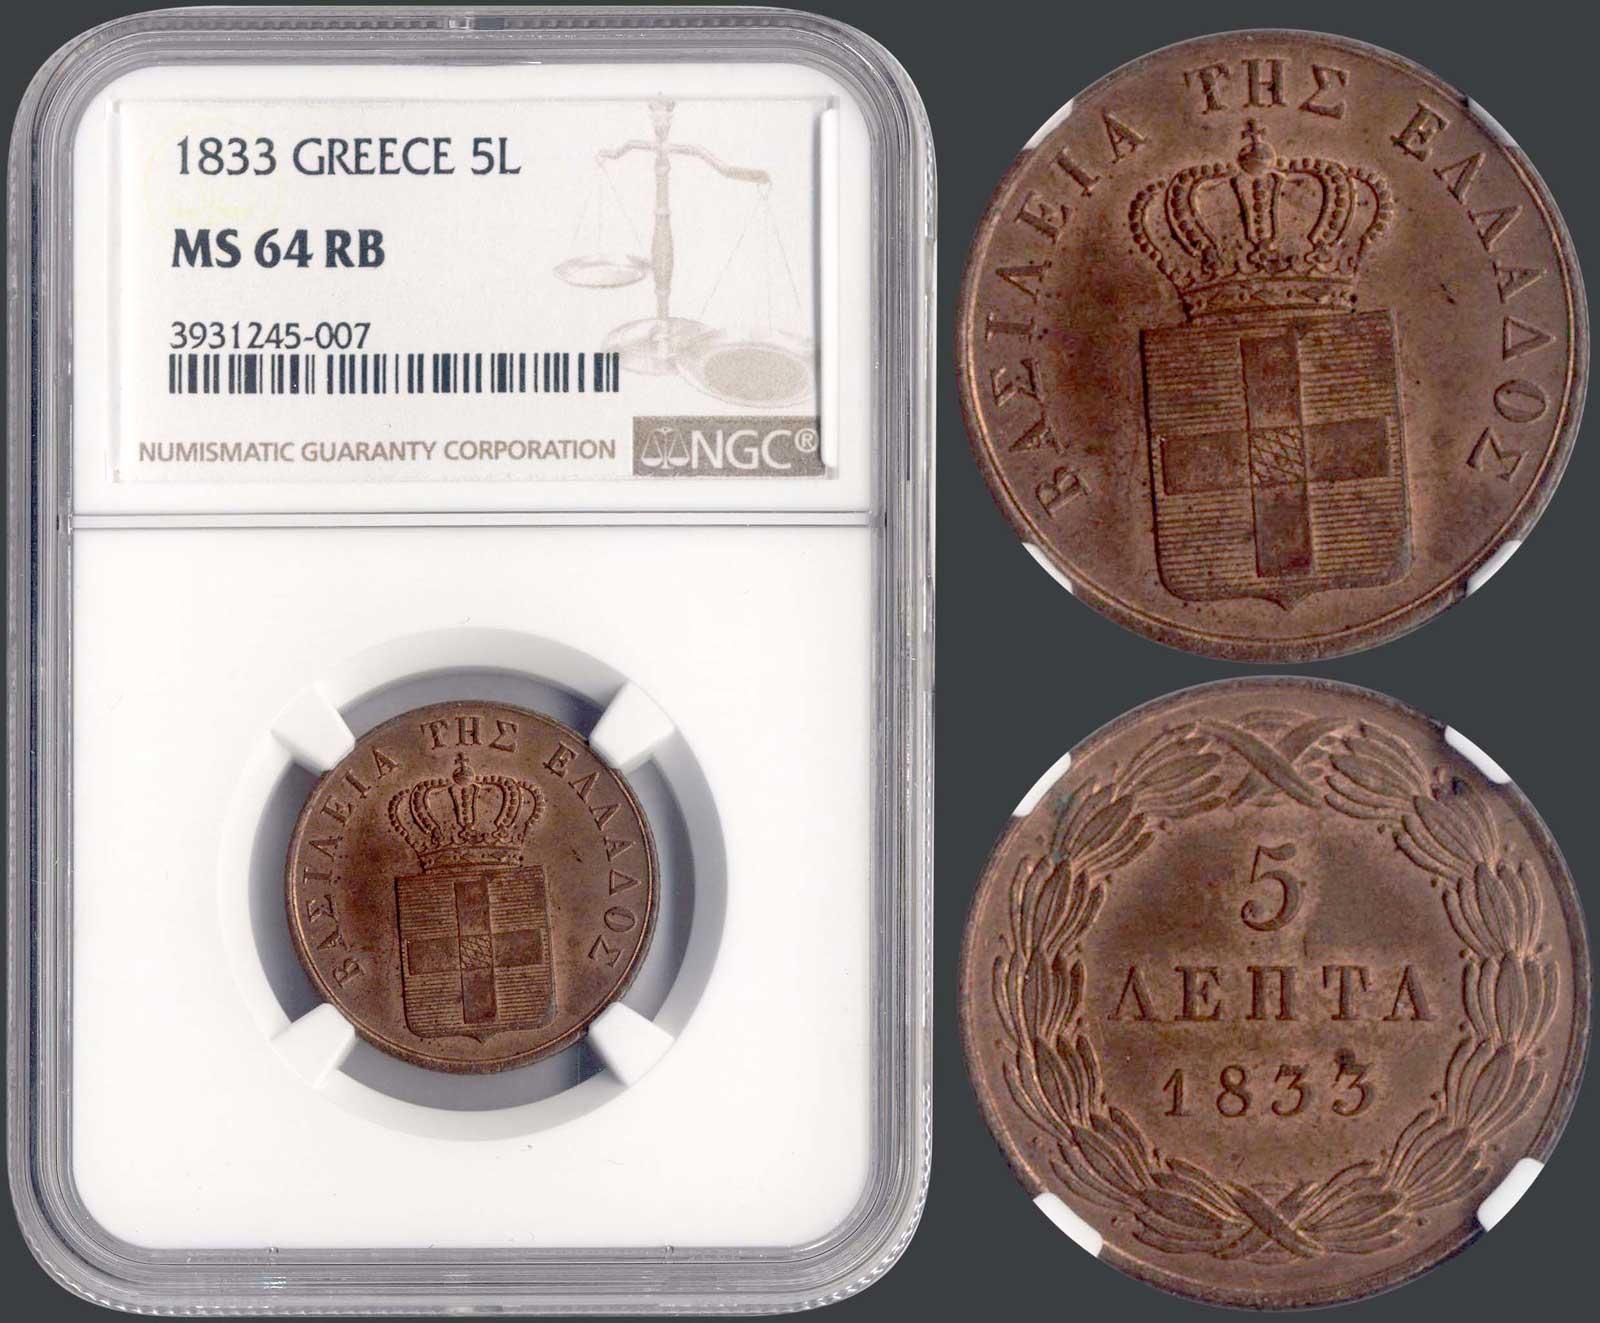 Lot 9050 - GREECE-  COINS & TOKENS king otto -  A. Karamitsos Public & LIVE Bid Auction 610 Coins, Medals & Banknotes